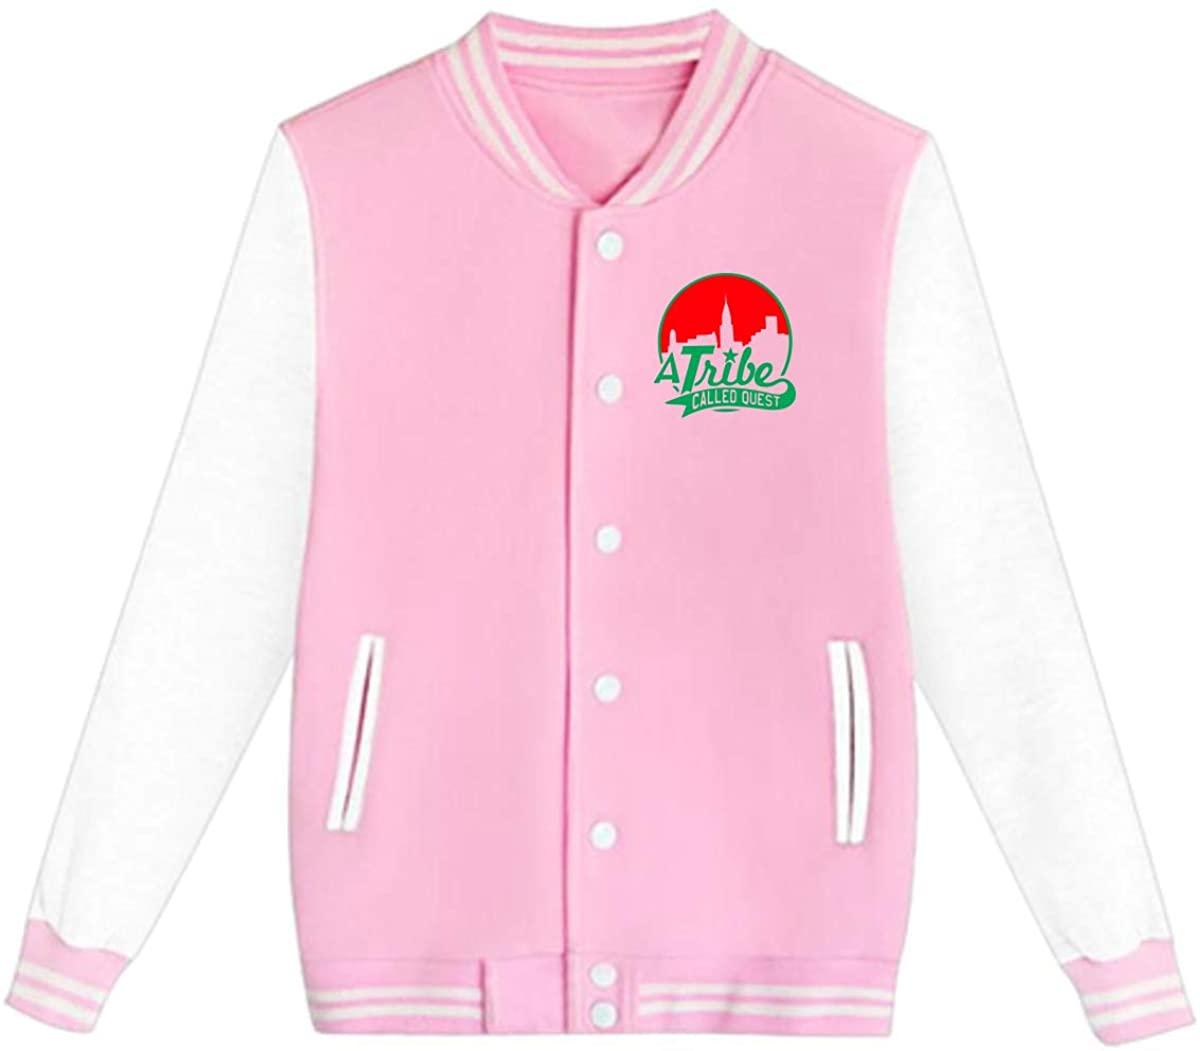 A Tribe Called Quest ATCQ Logo Unisex Youth Boys and Girls Sweatshirt Baseball Uniform Jacket Sport Coat